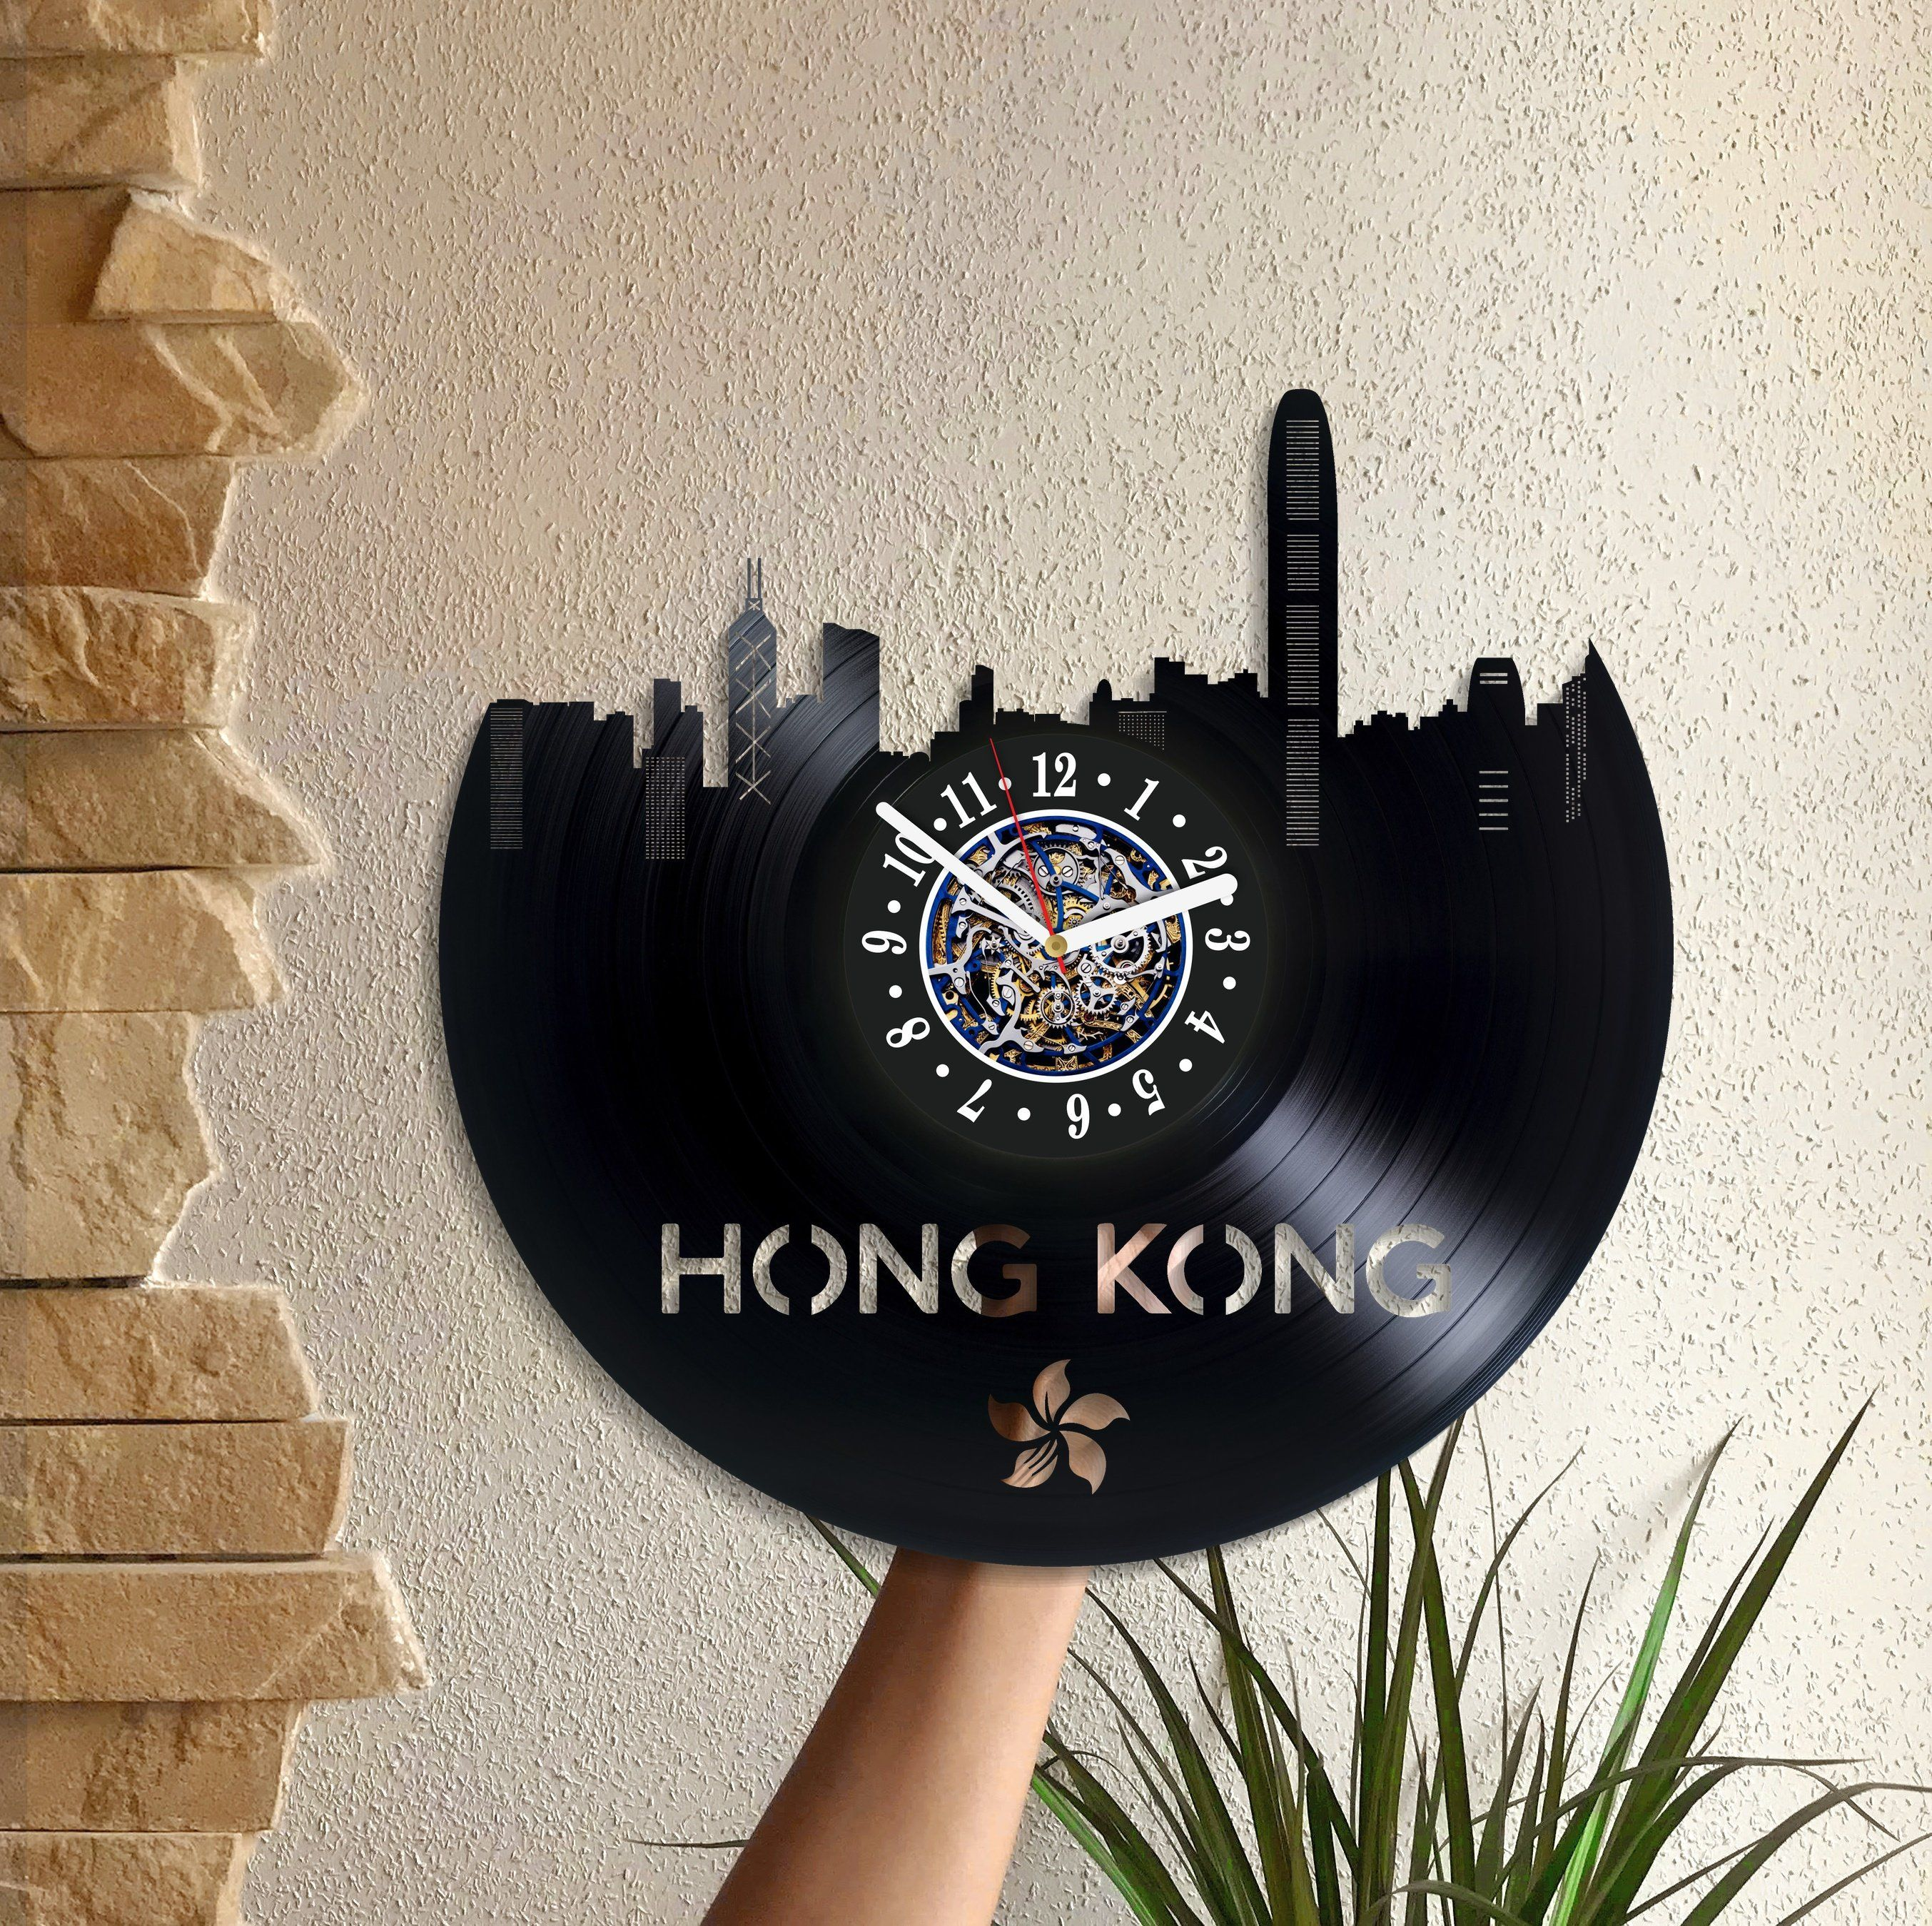 Hong Kong Room Art Lp Retro Vinyl Record China Wall Clock Large Travel Birthday Gift For Him Handmade By DecorPlaza